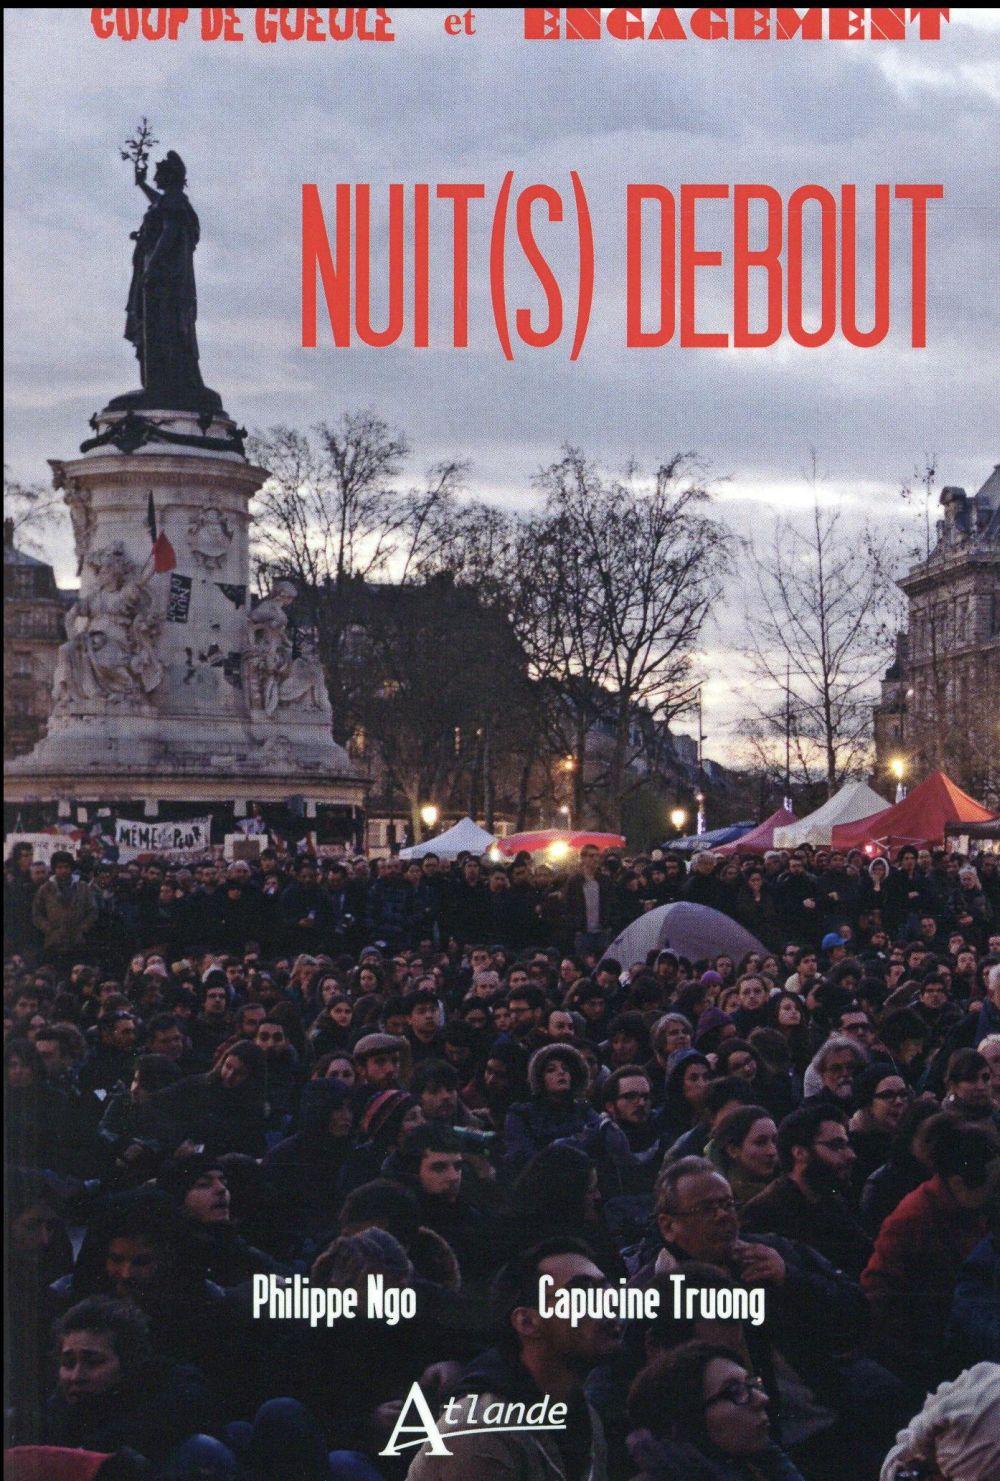 NUIT(S) DEBOUT